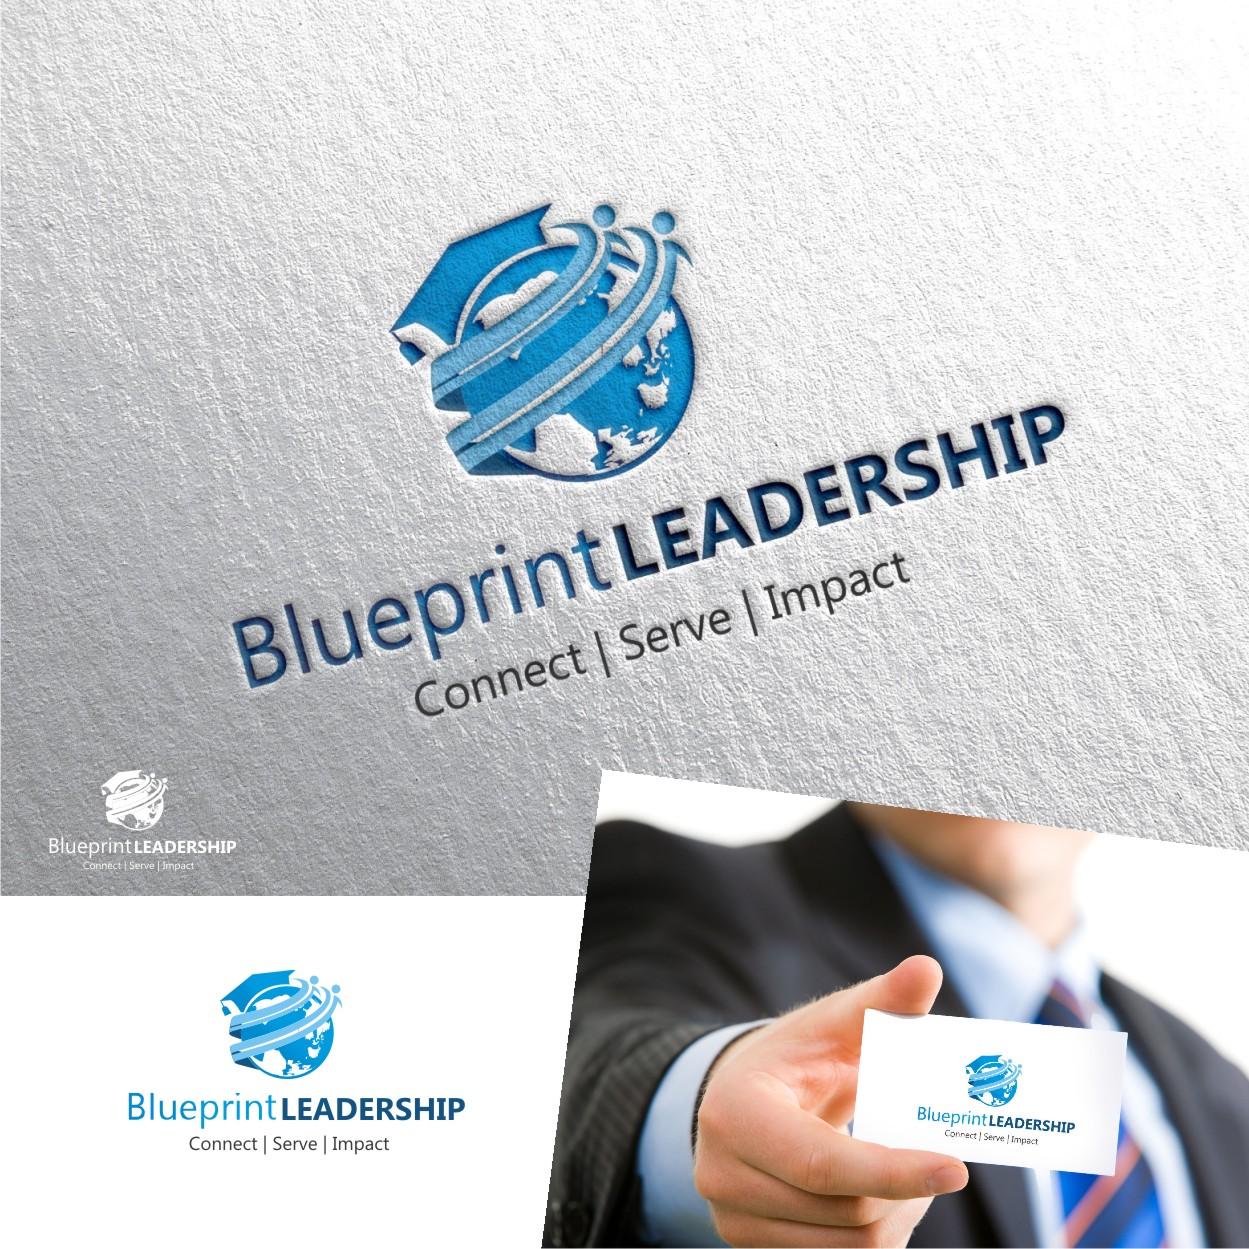 Modern upmarket logo design for tj associates llc by bkoh design logo design by bkoh for blueprint leadership logo design design 15312767 malvernweather Gallery